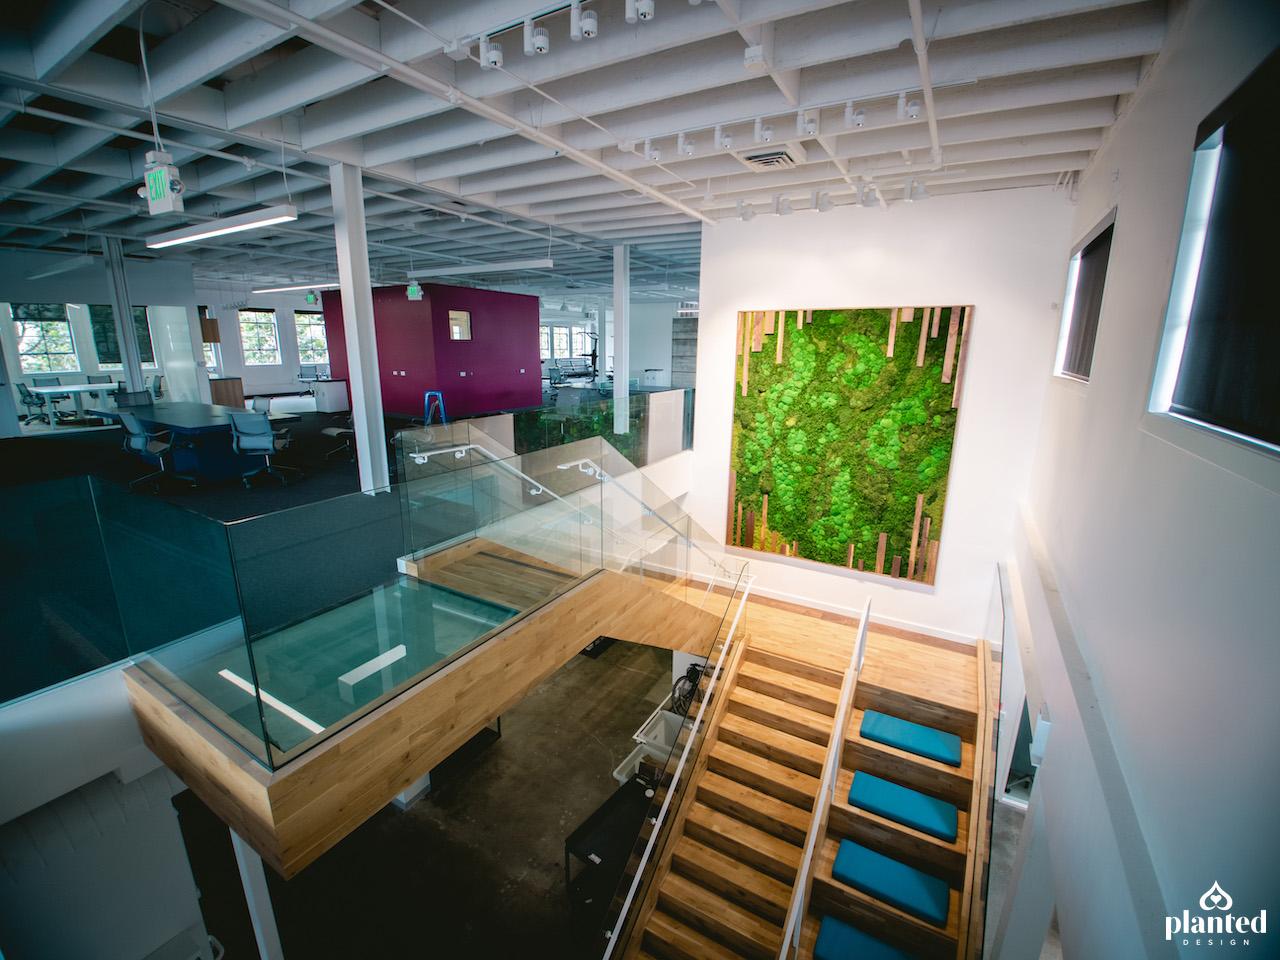 PlantedDesign_MossWall_PerfectDayFoods_Emeryville_California_Office_fixed.jpg